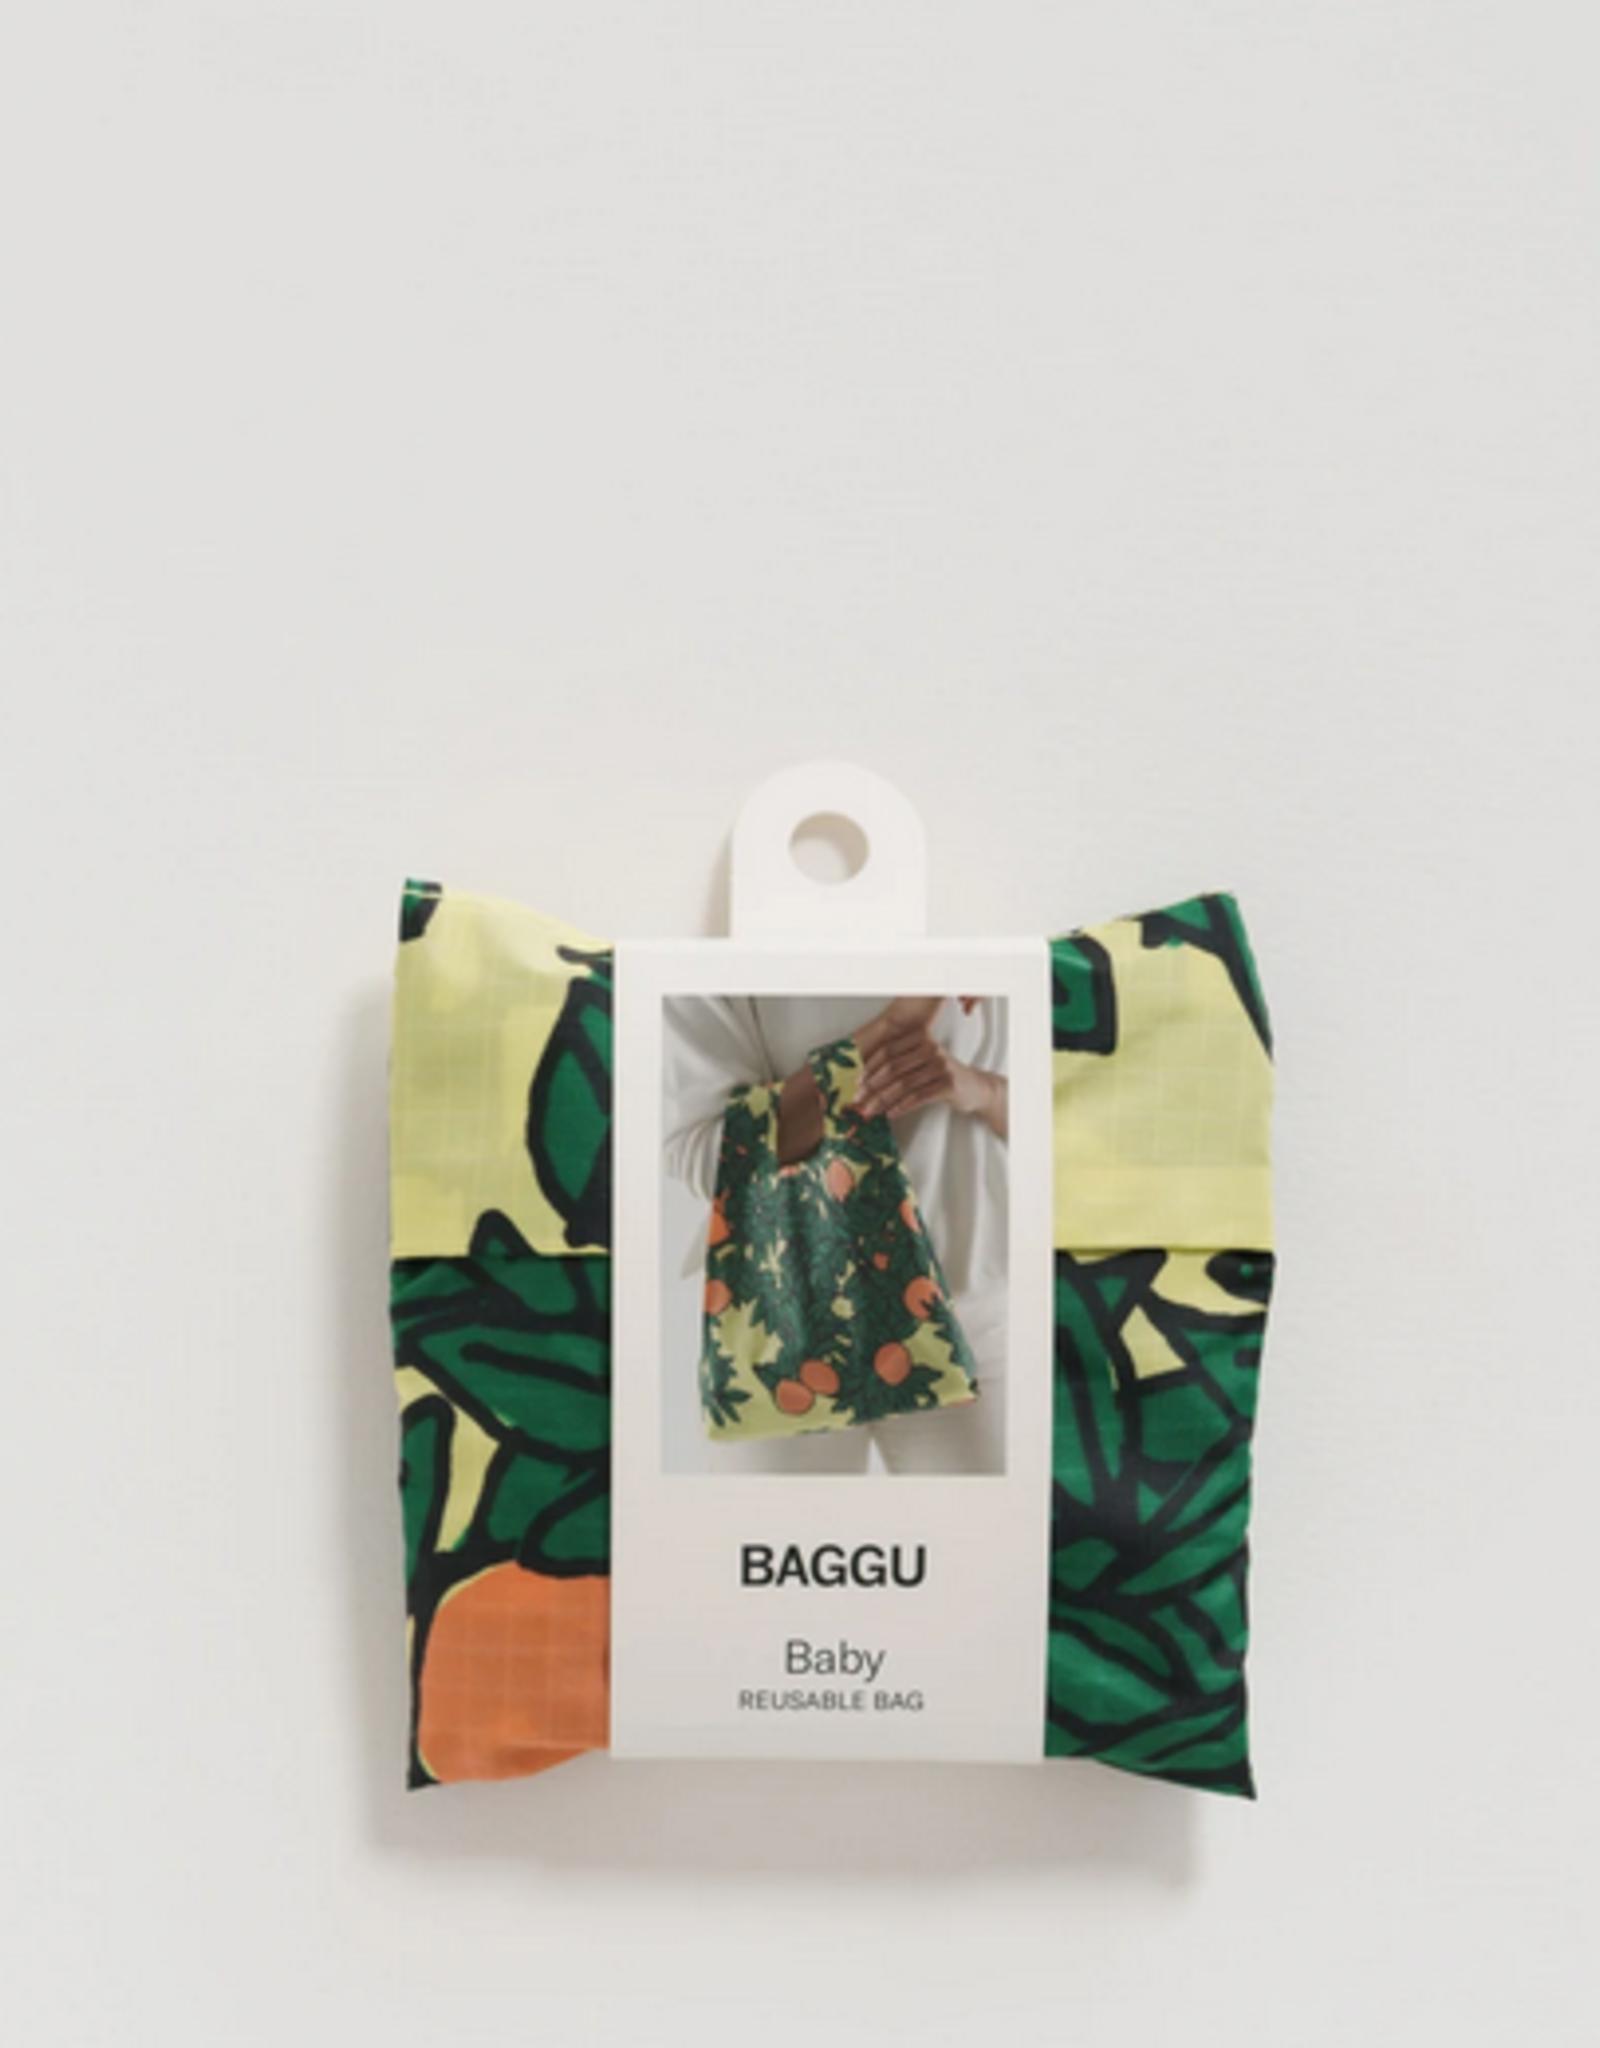 Baggu Baby Reusable bag Orange tree